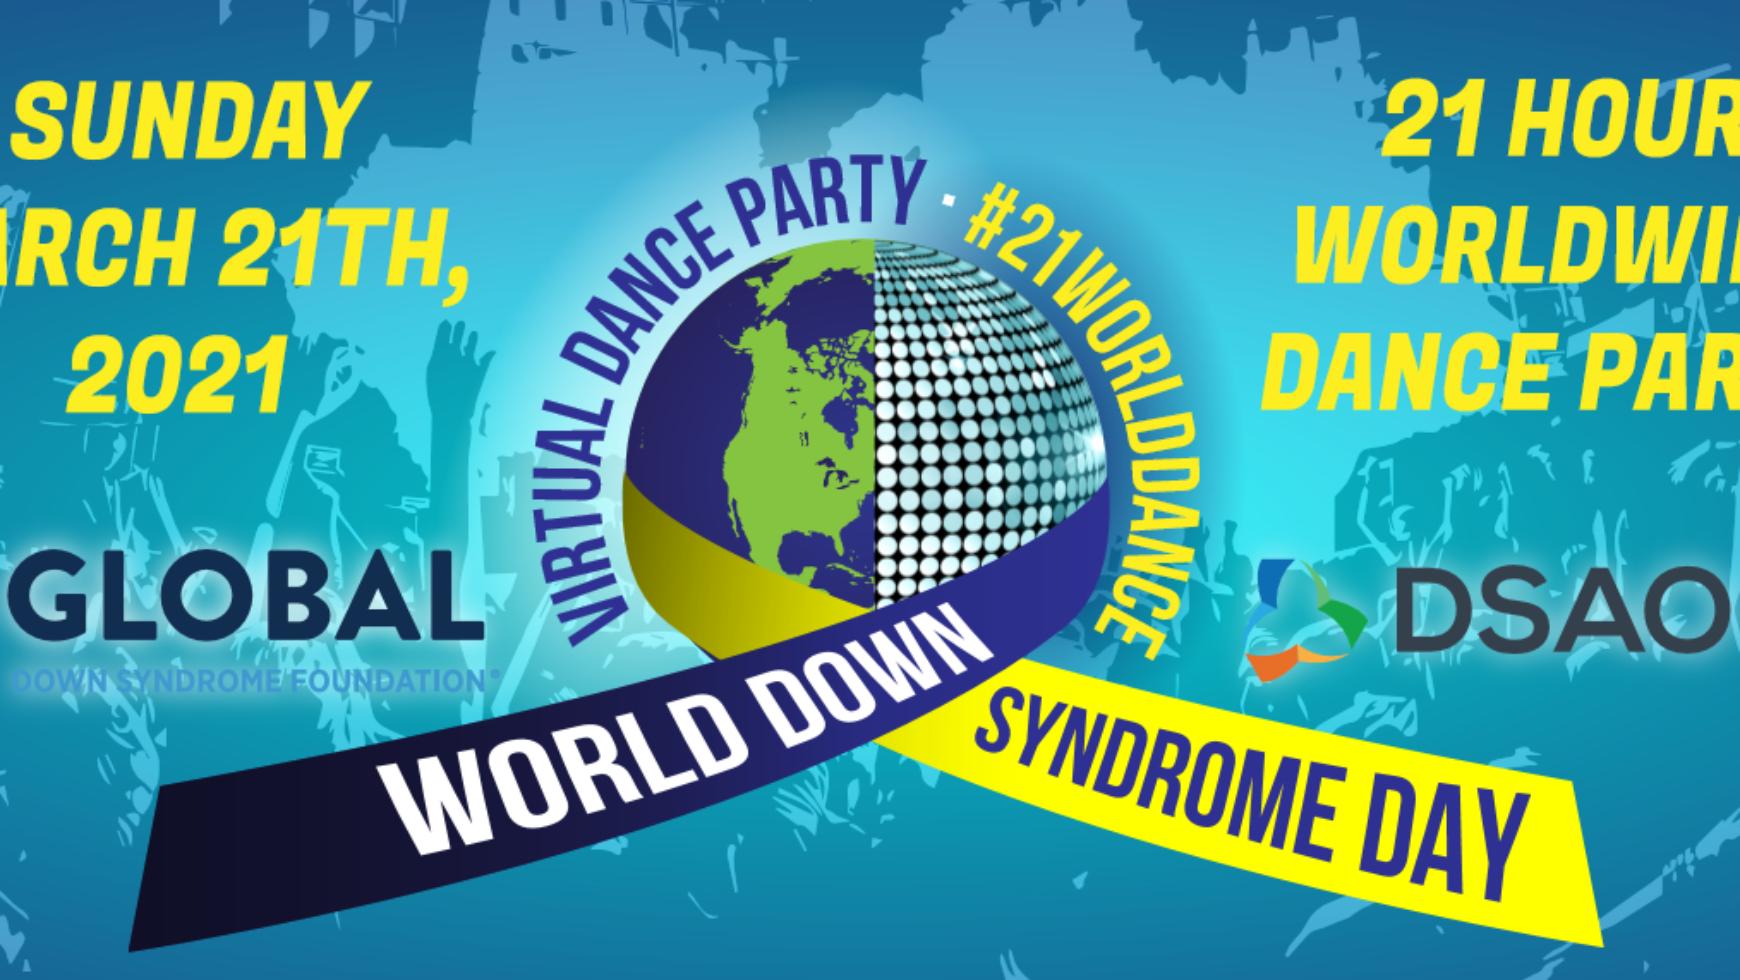 #21WorldDance – World Down Syndrome Day 2021 virtual celebration